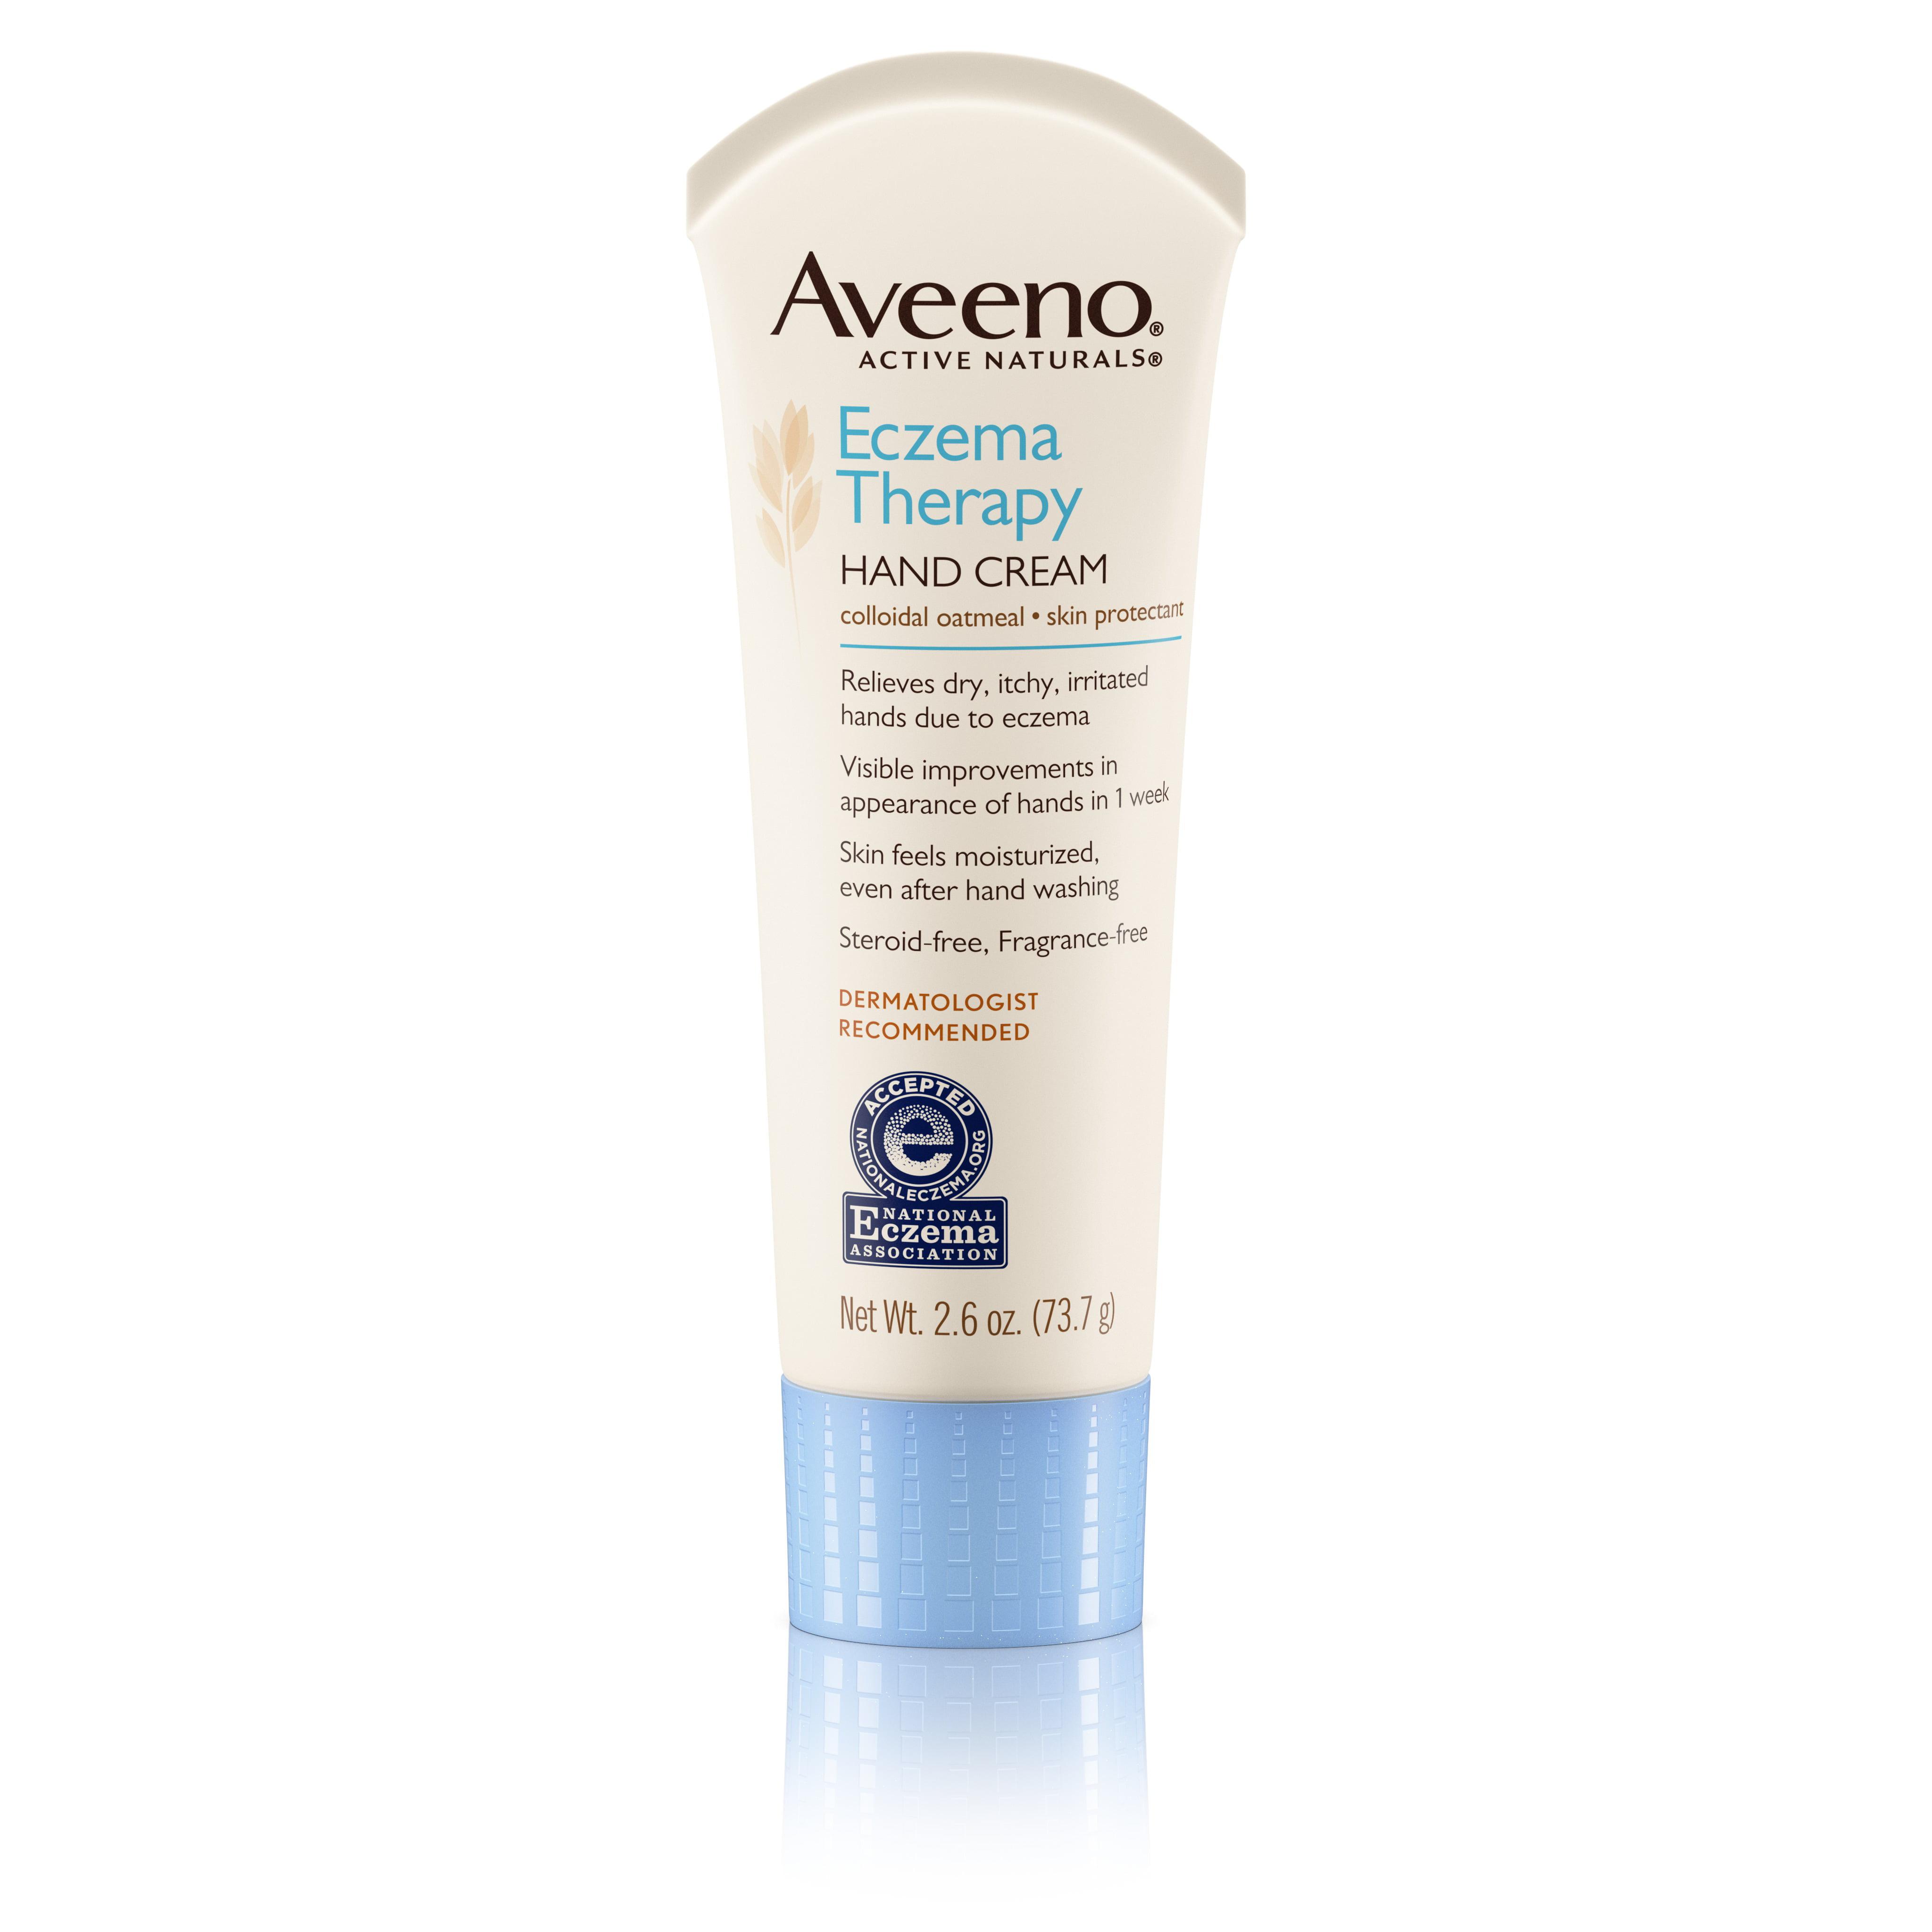 Aveeno Eczema Therapy Hand & Face Cream, Travel-Size Lotion, 2.6 oz